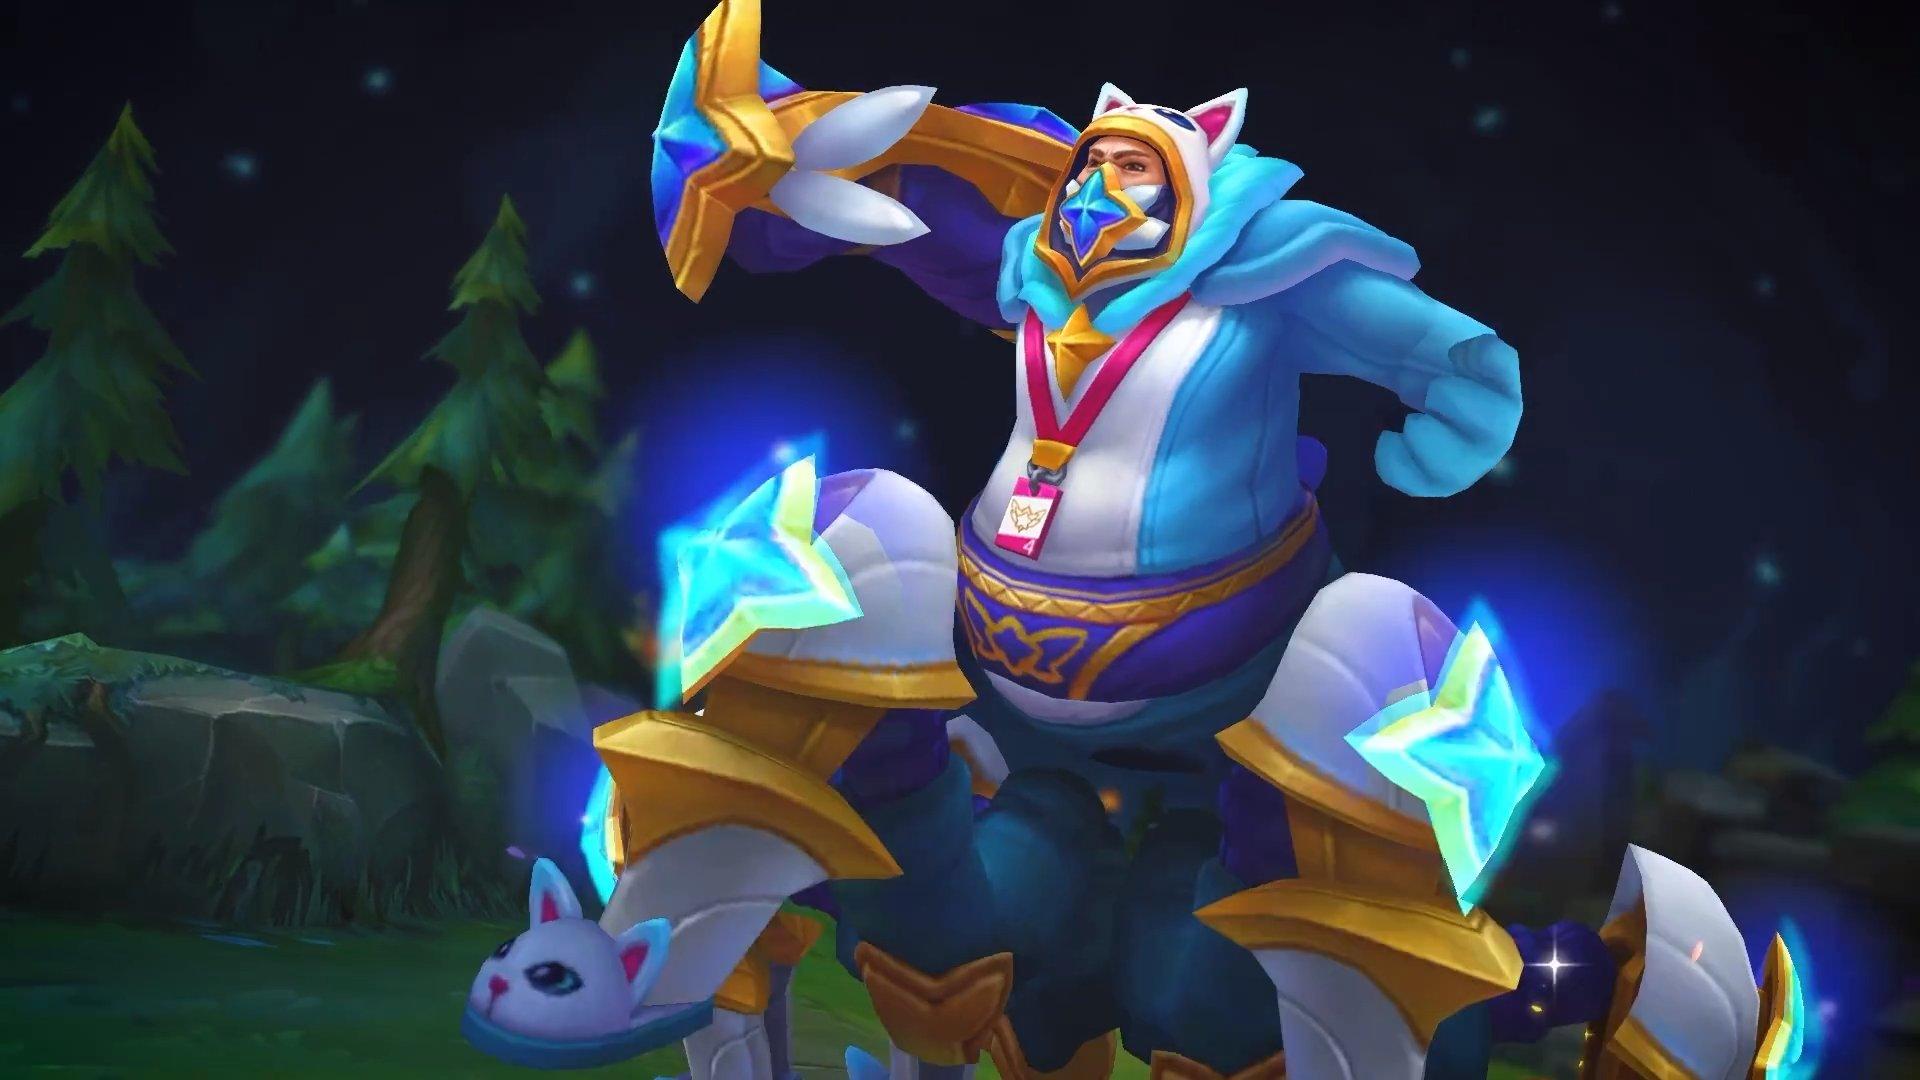 league of legends pajama guardian cosplay urgot skin